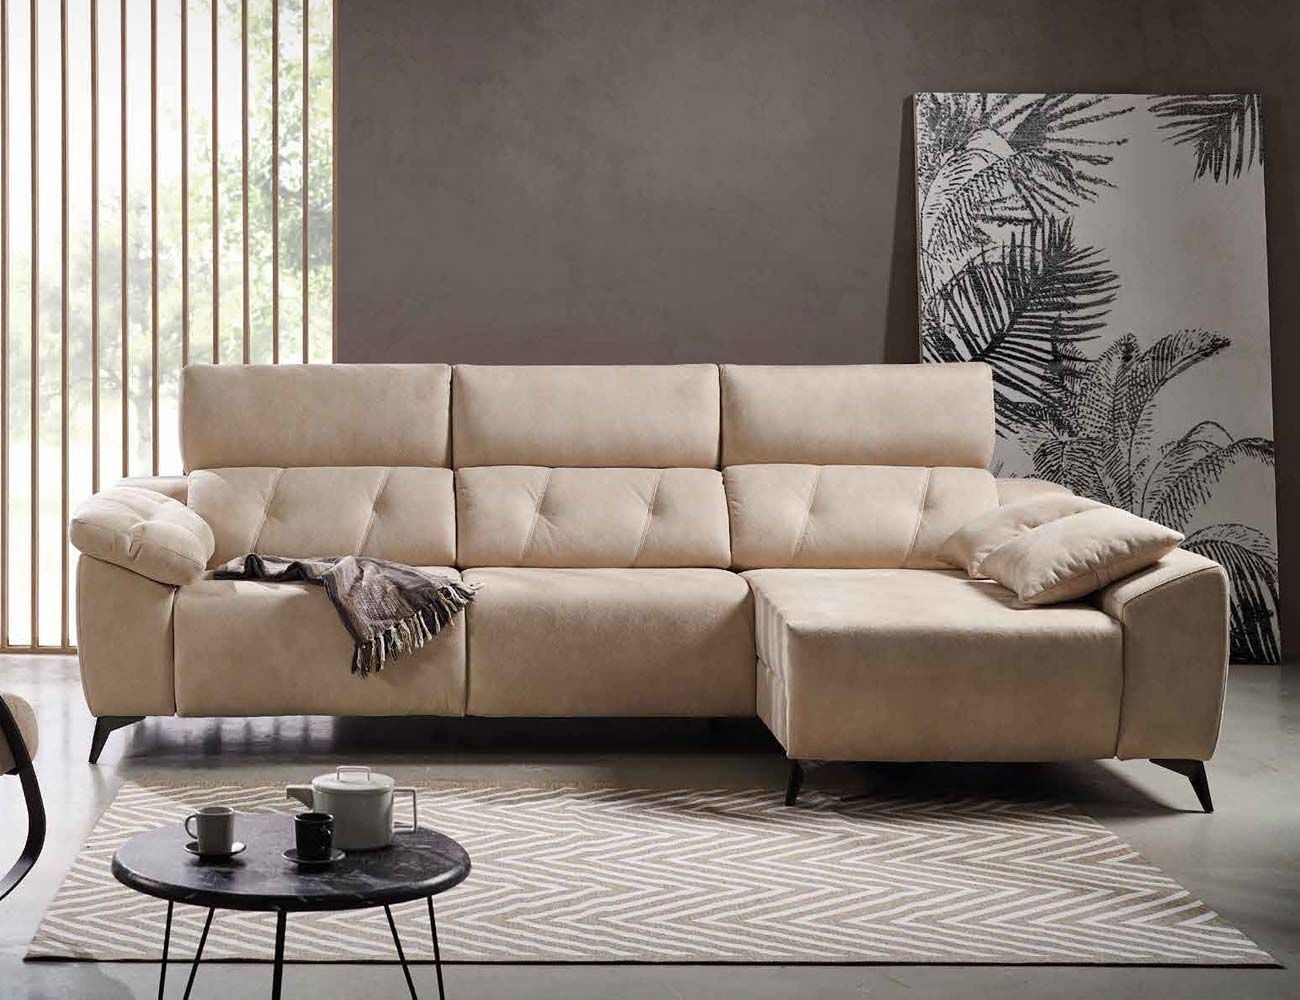 Sofa onix acomodel 1